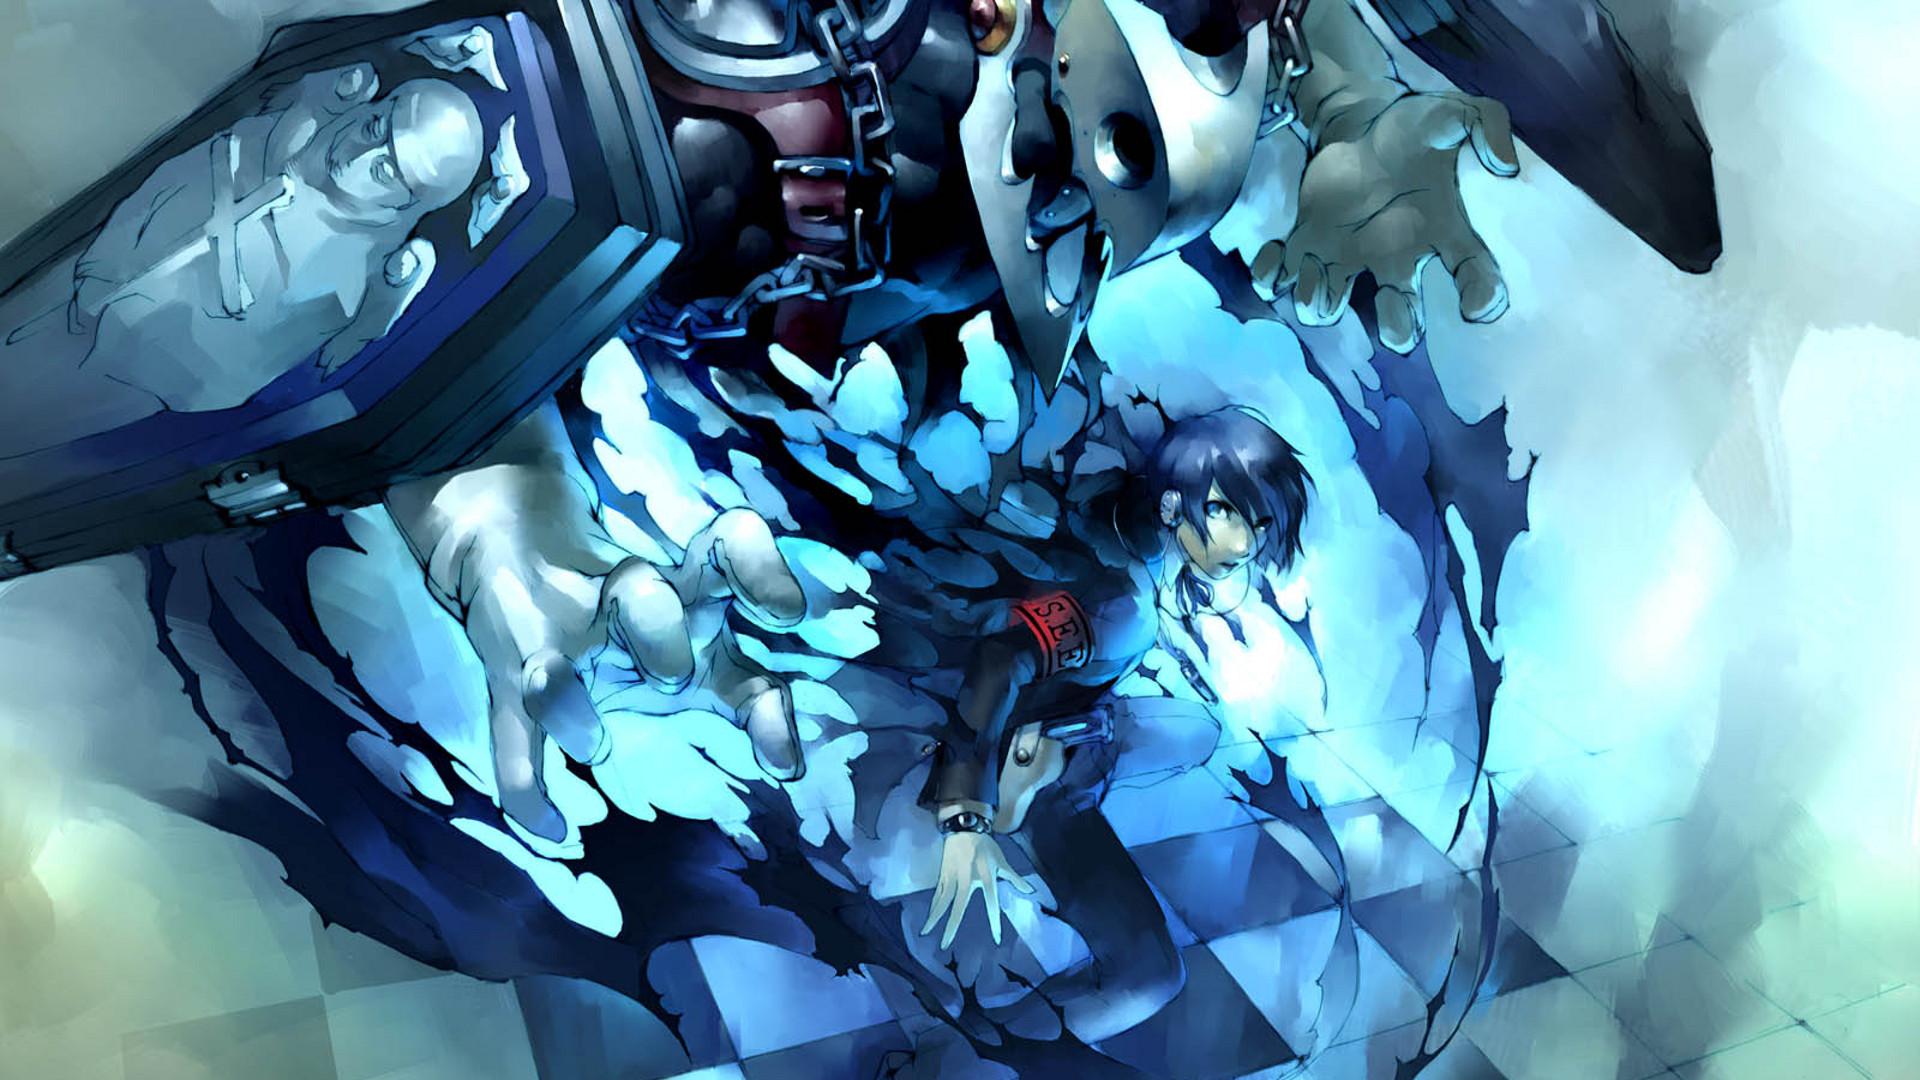 Shin Megami Tensei: Persona 3 Details